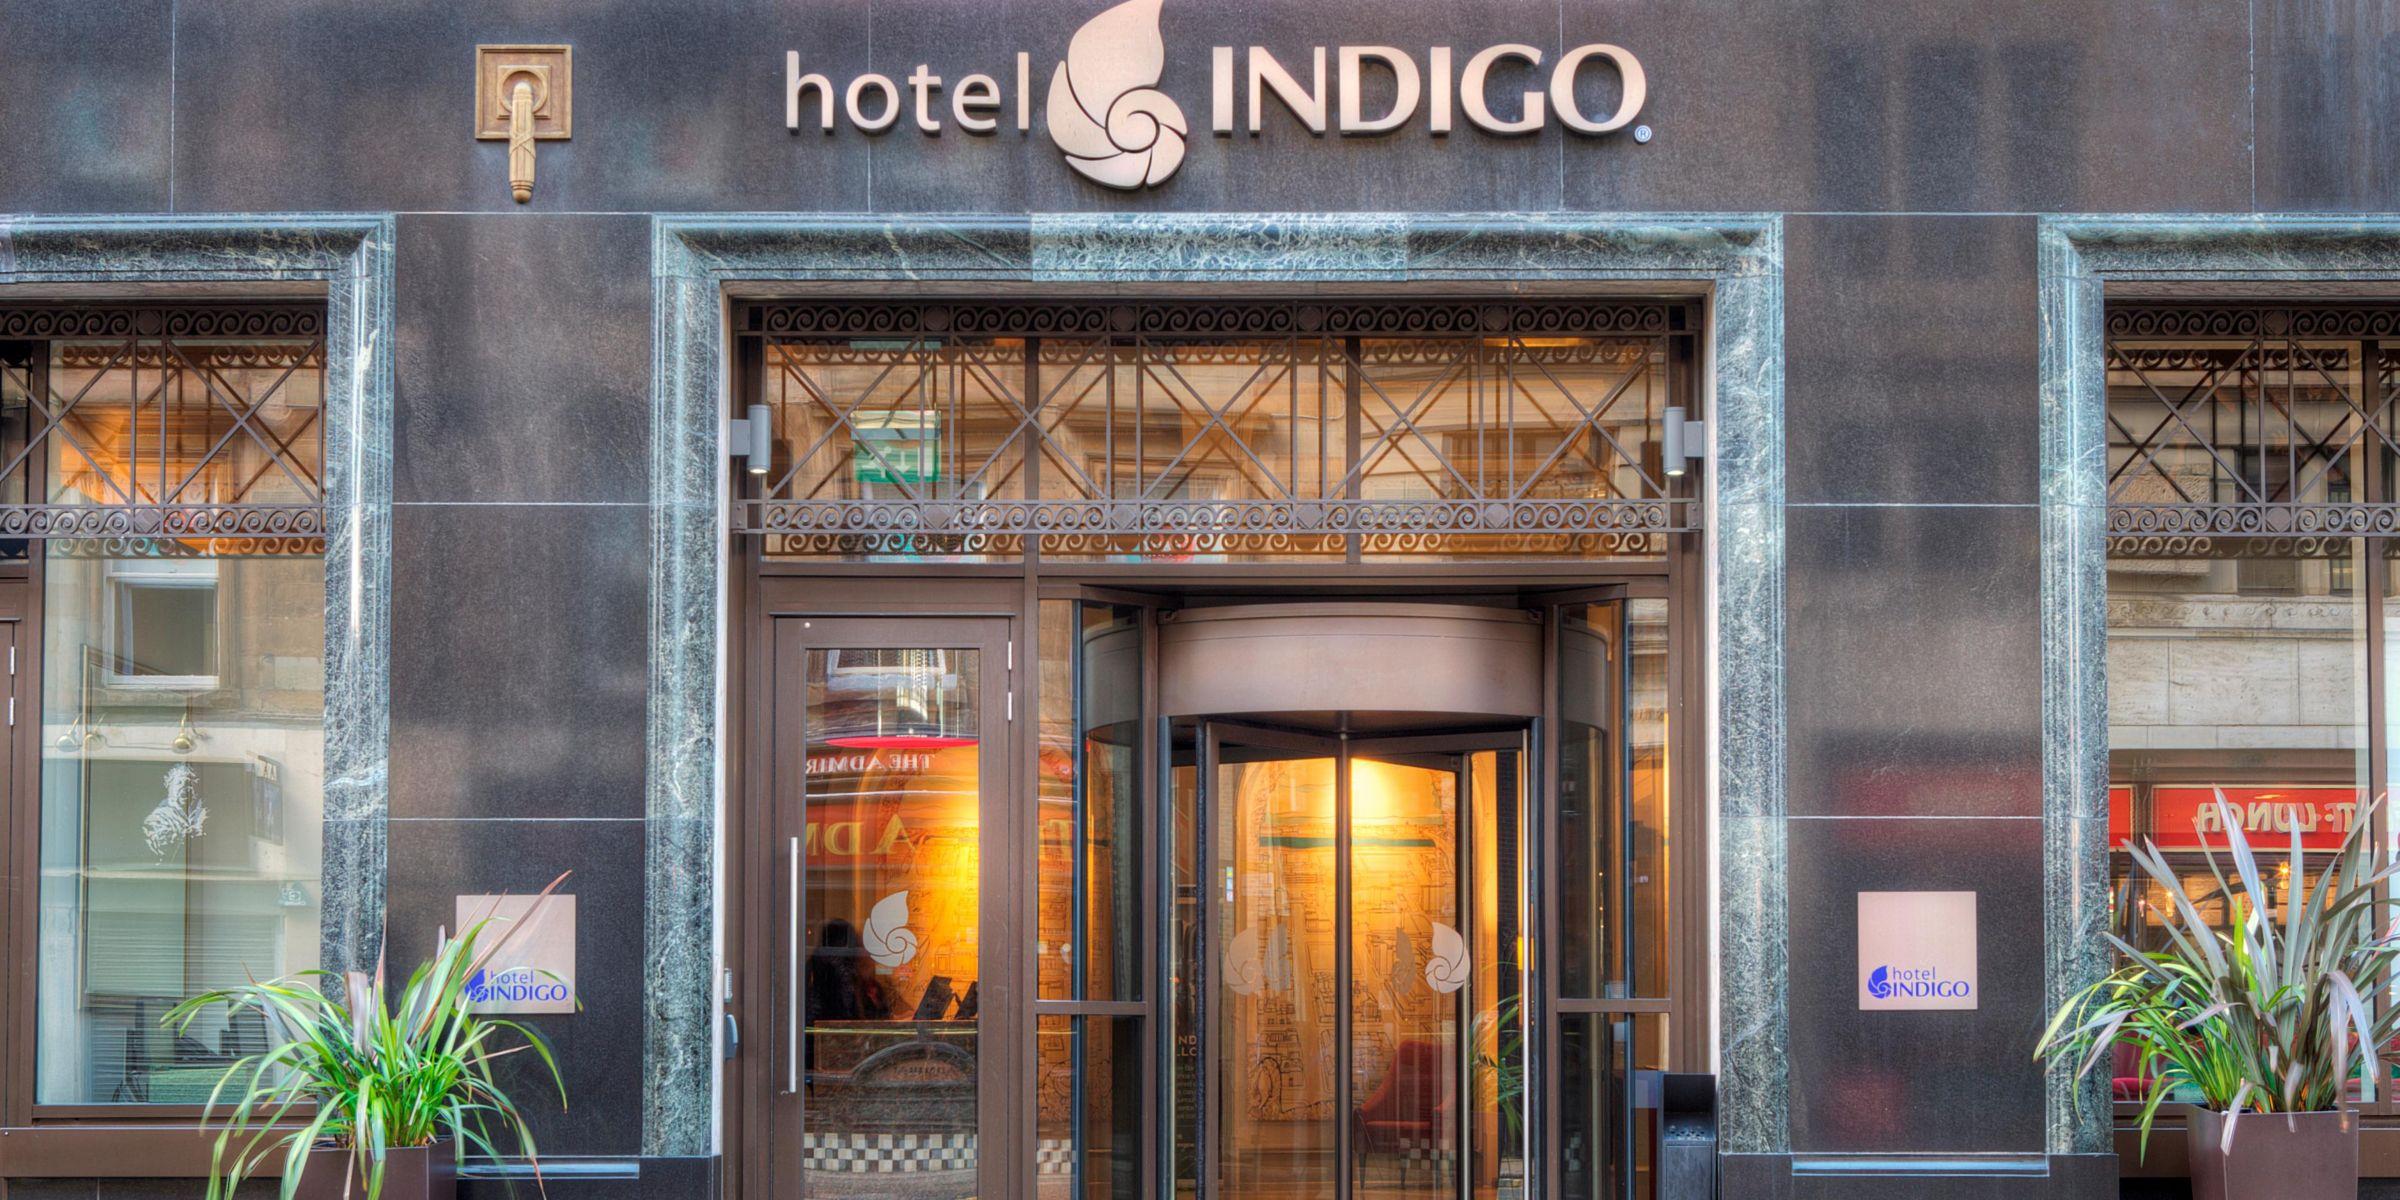 Hotel Indigo Glasgow A Warm Welcome Awaits You